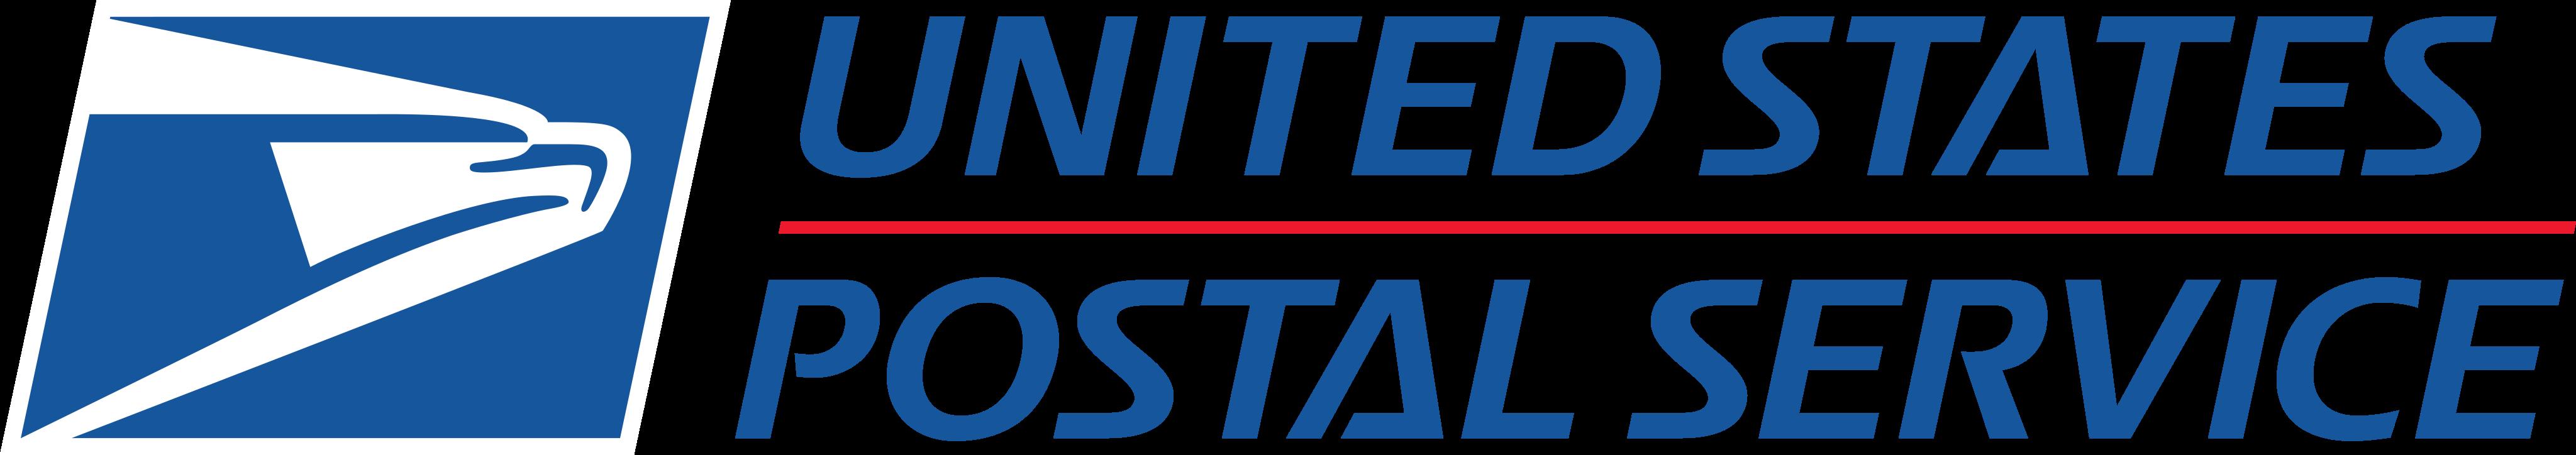 united states postal service usps logo - USPS Logo - United States Postal Service Logo